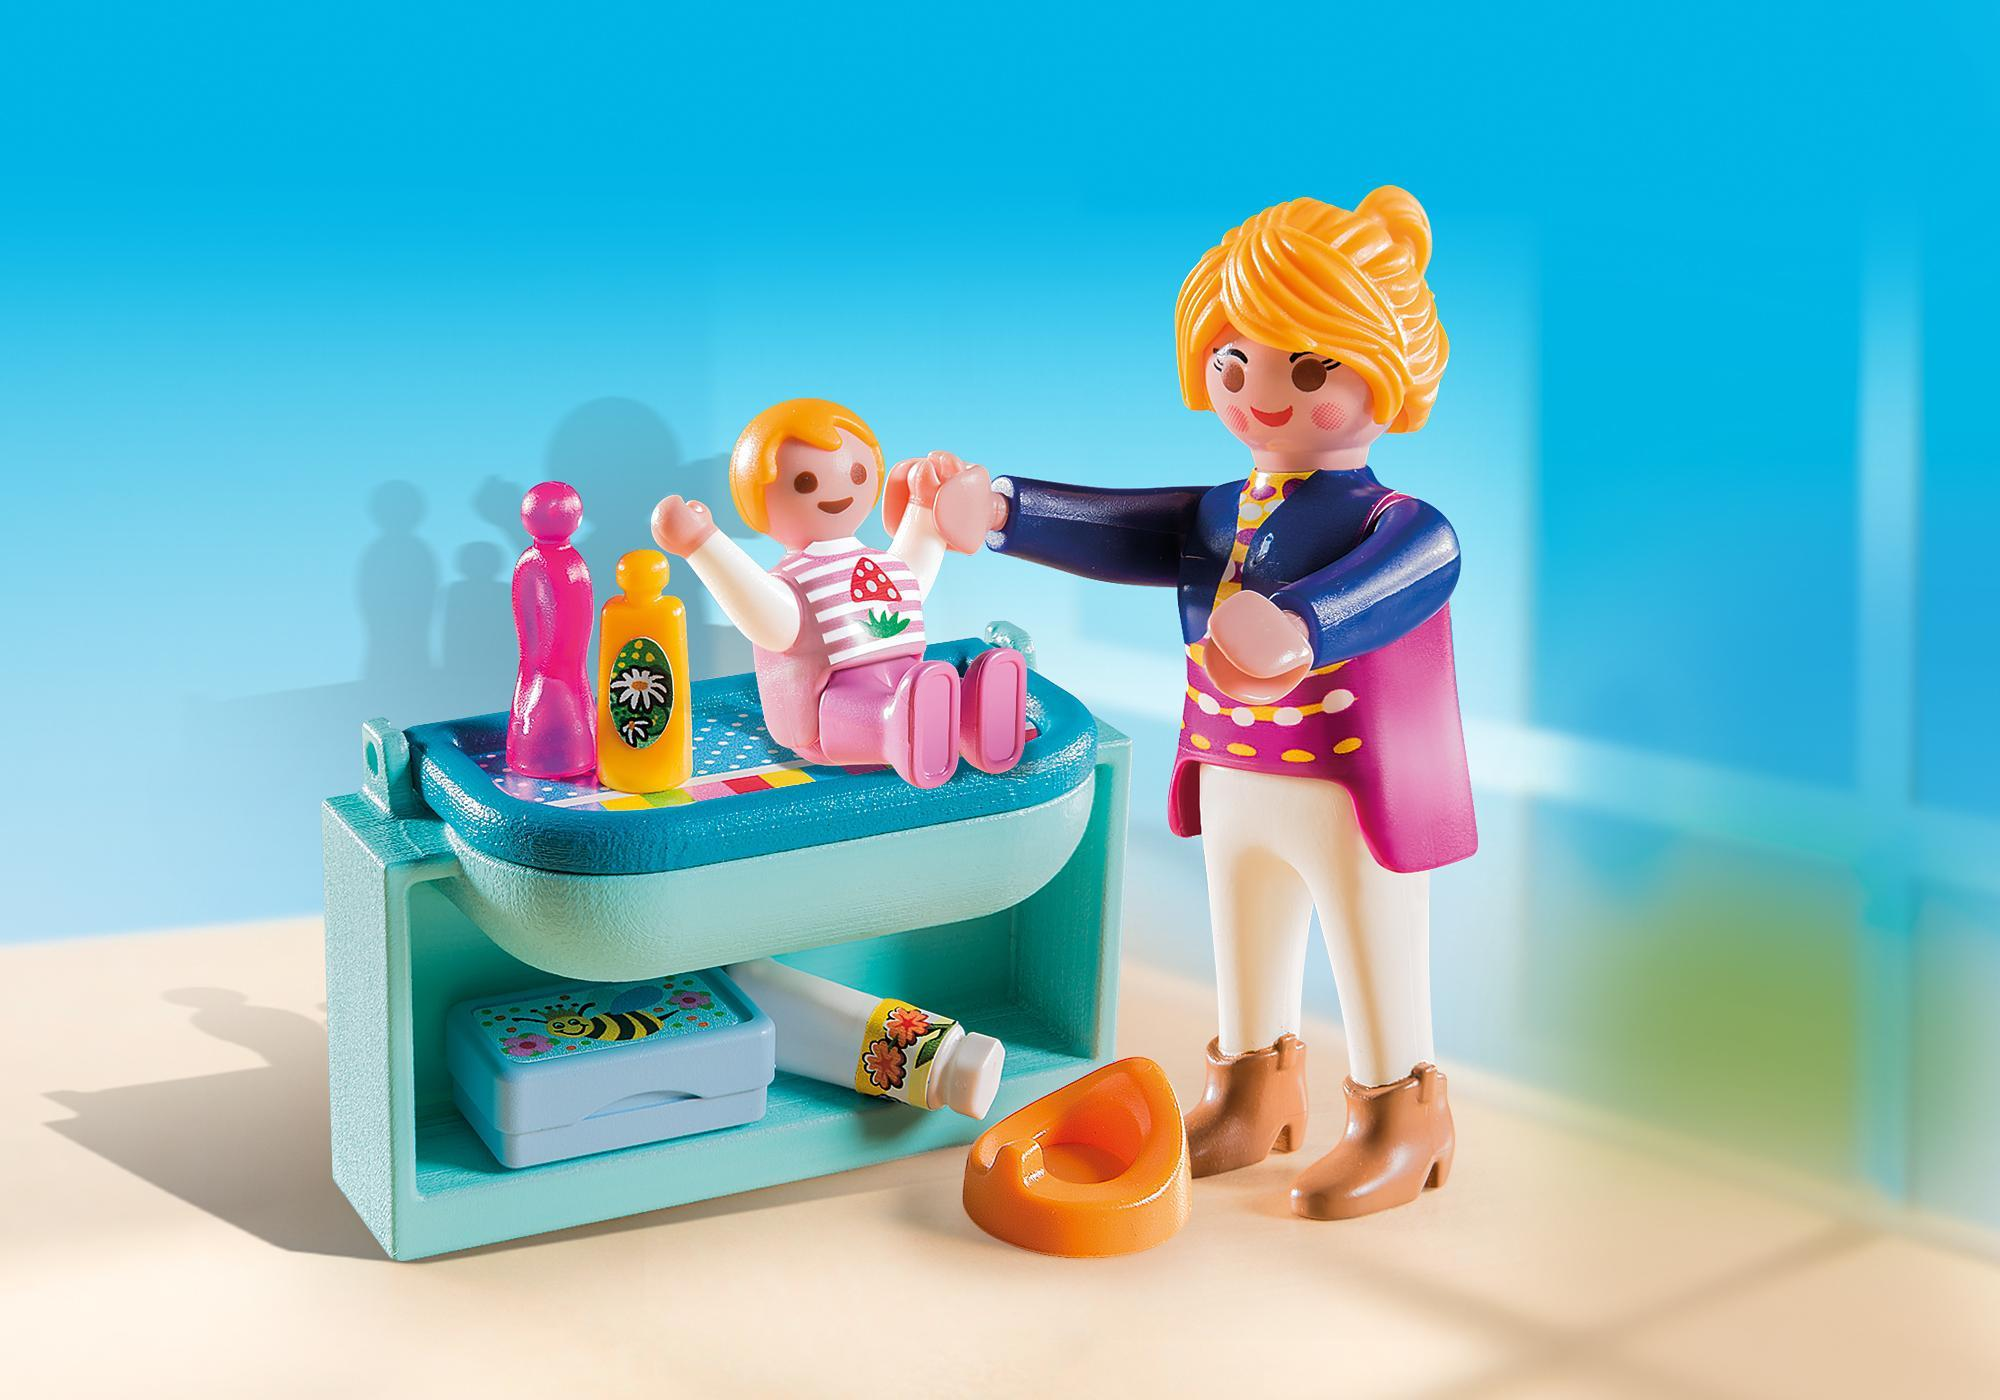 http://media.playmobil.com/i/playmobil/5368_product_detail/Mamá y Niño con Cambiador